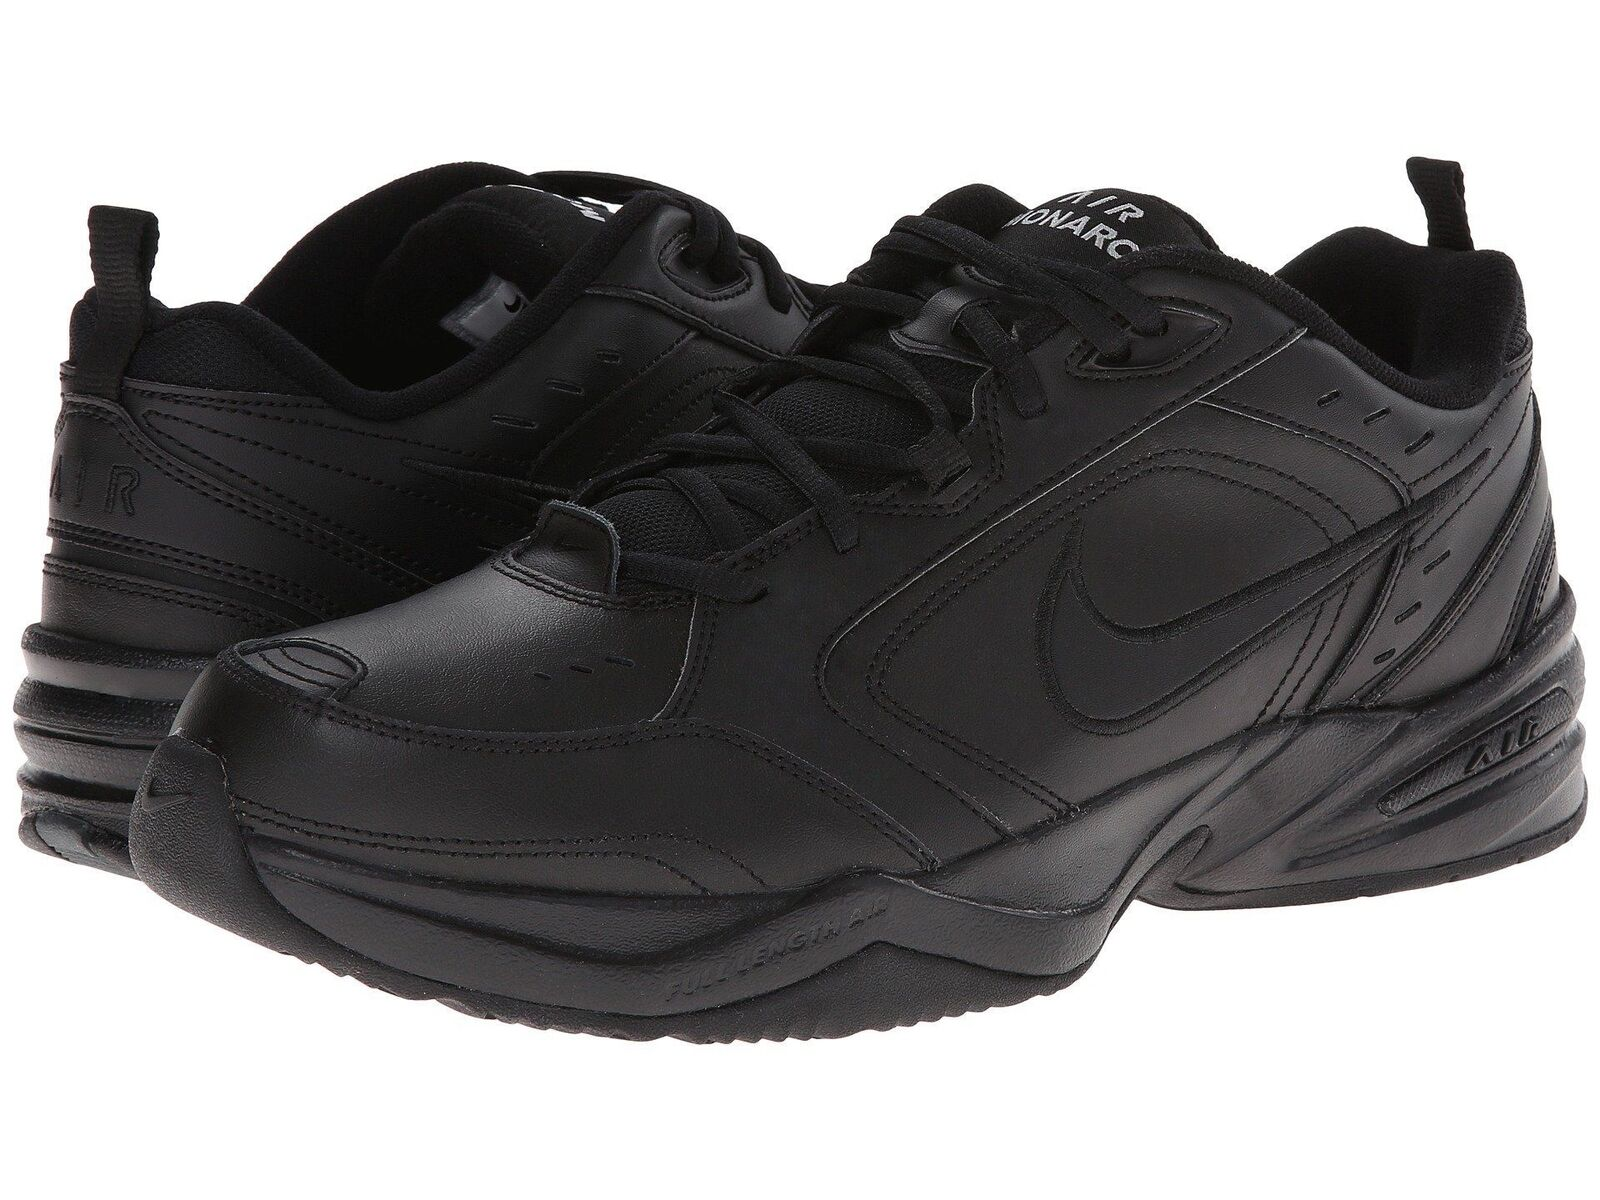 Nike Air Monarch IV All Black 415445001 Men's Cross Training shoes